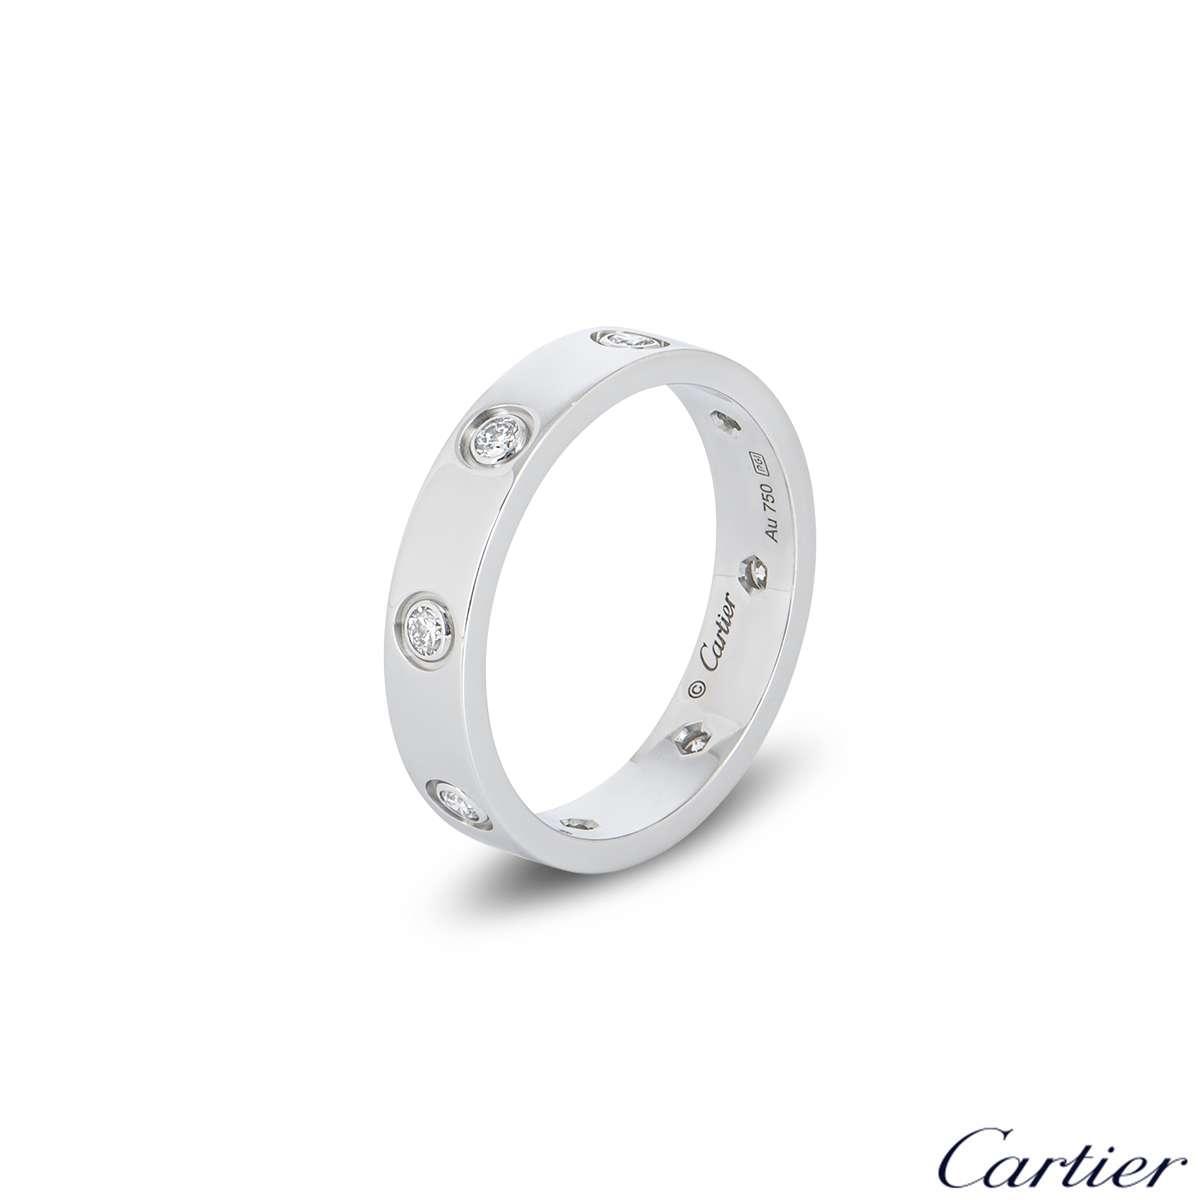 CartierFull Diamond Love Wedding Band Size 53B40506500